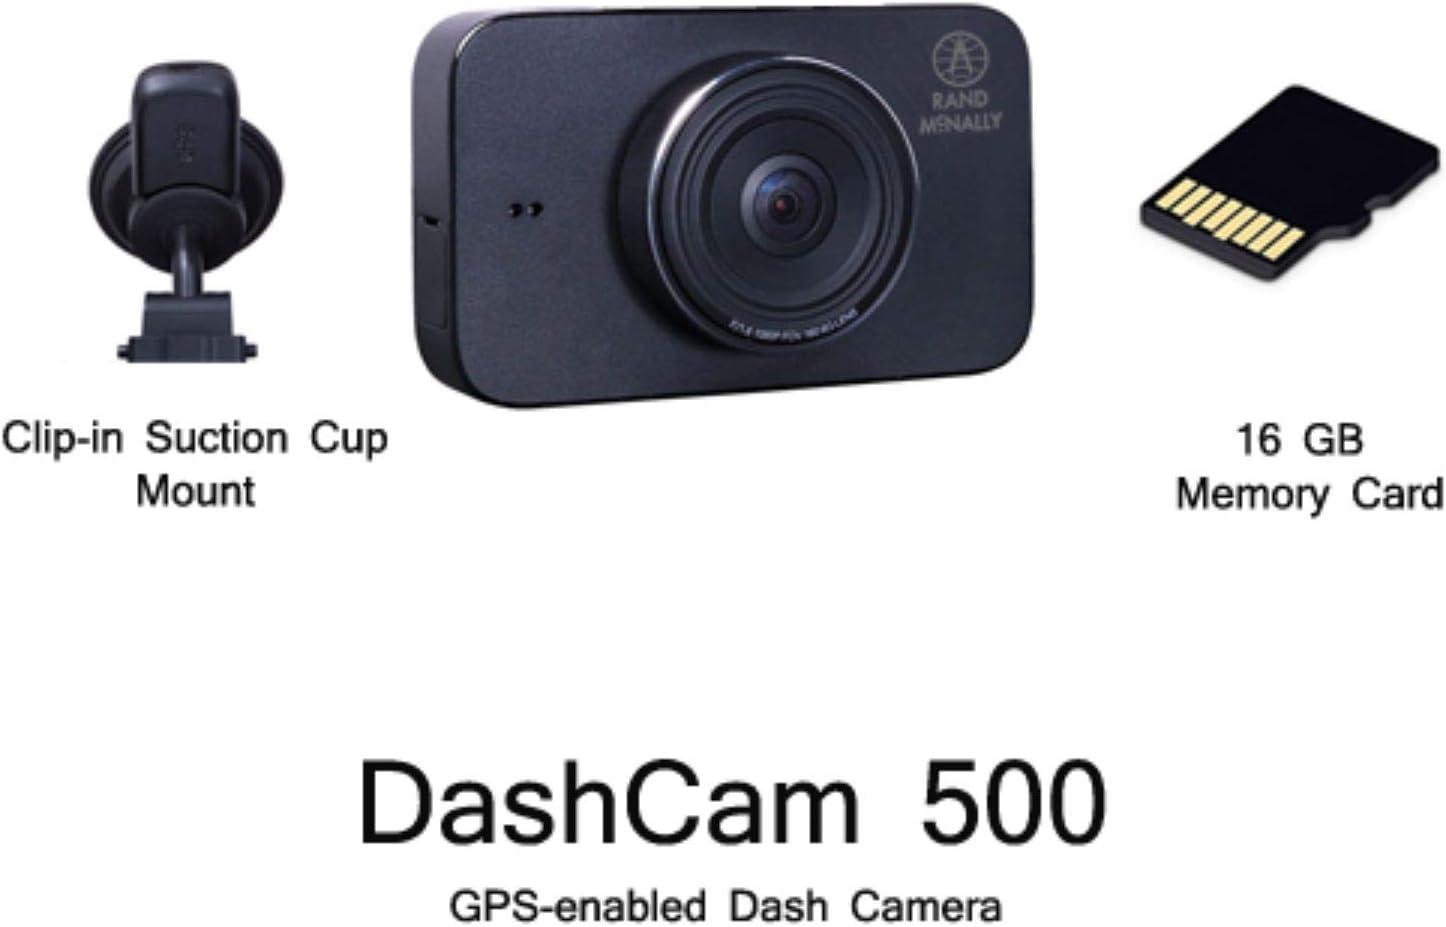 Rand McNally DashCam 500 Wi-Fi-Enabled with 3 Inch Screen 1080p /& G Sensor Renewed